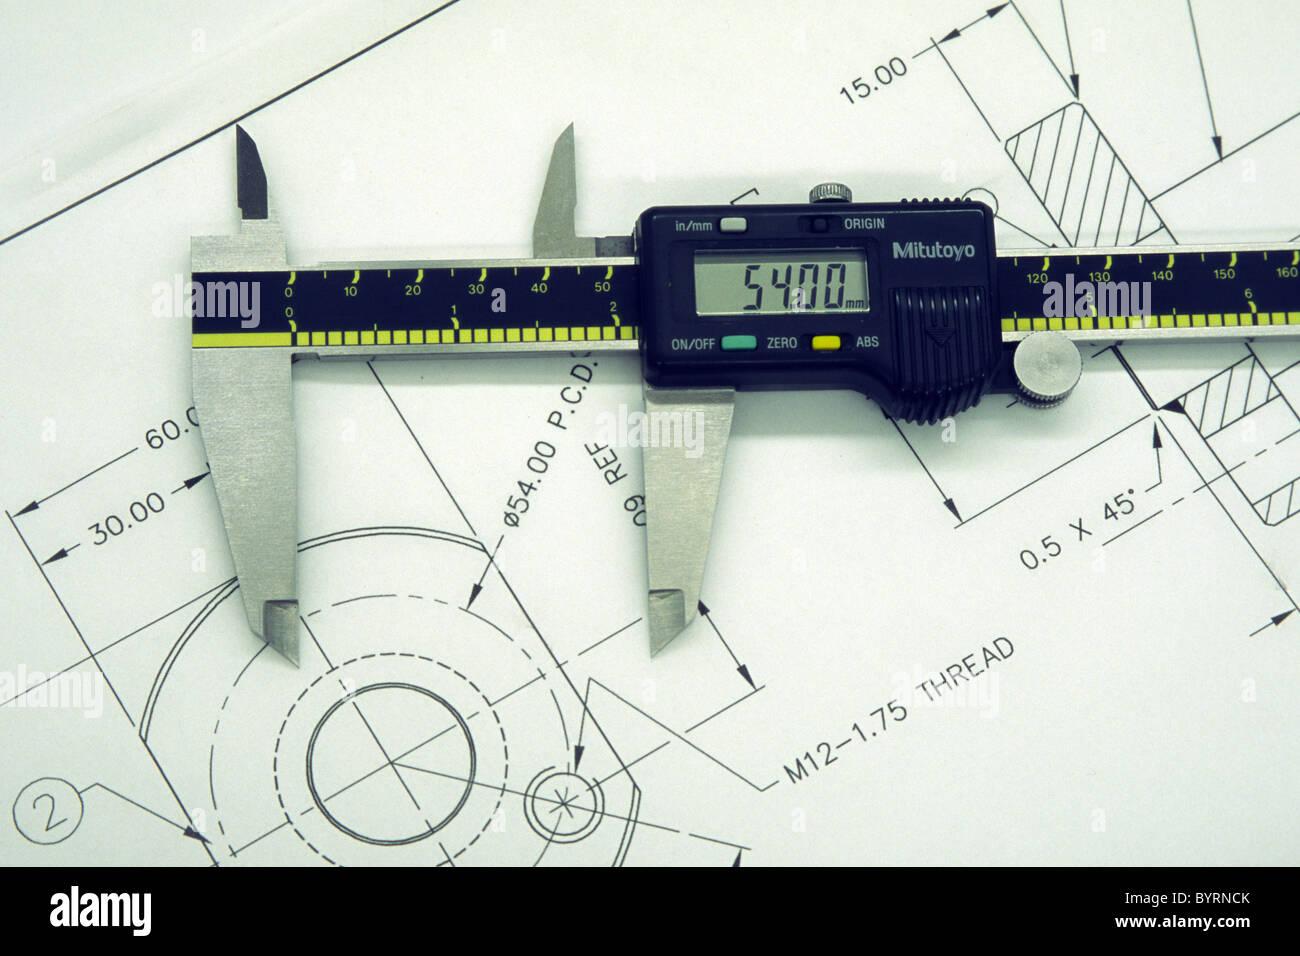 hight resolution of digital vernier caliper on an engineering drawing stock image